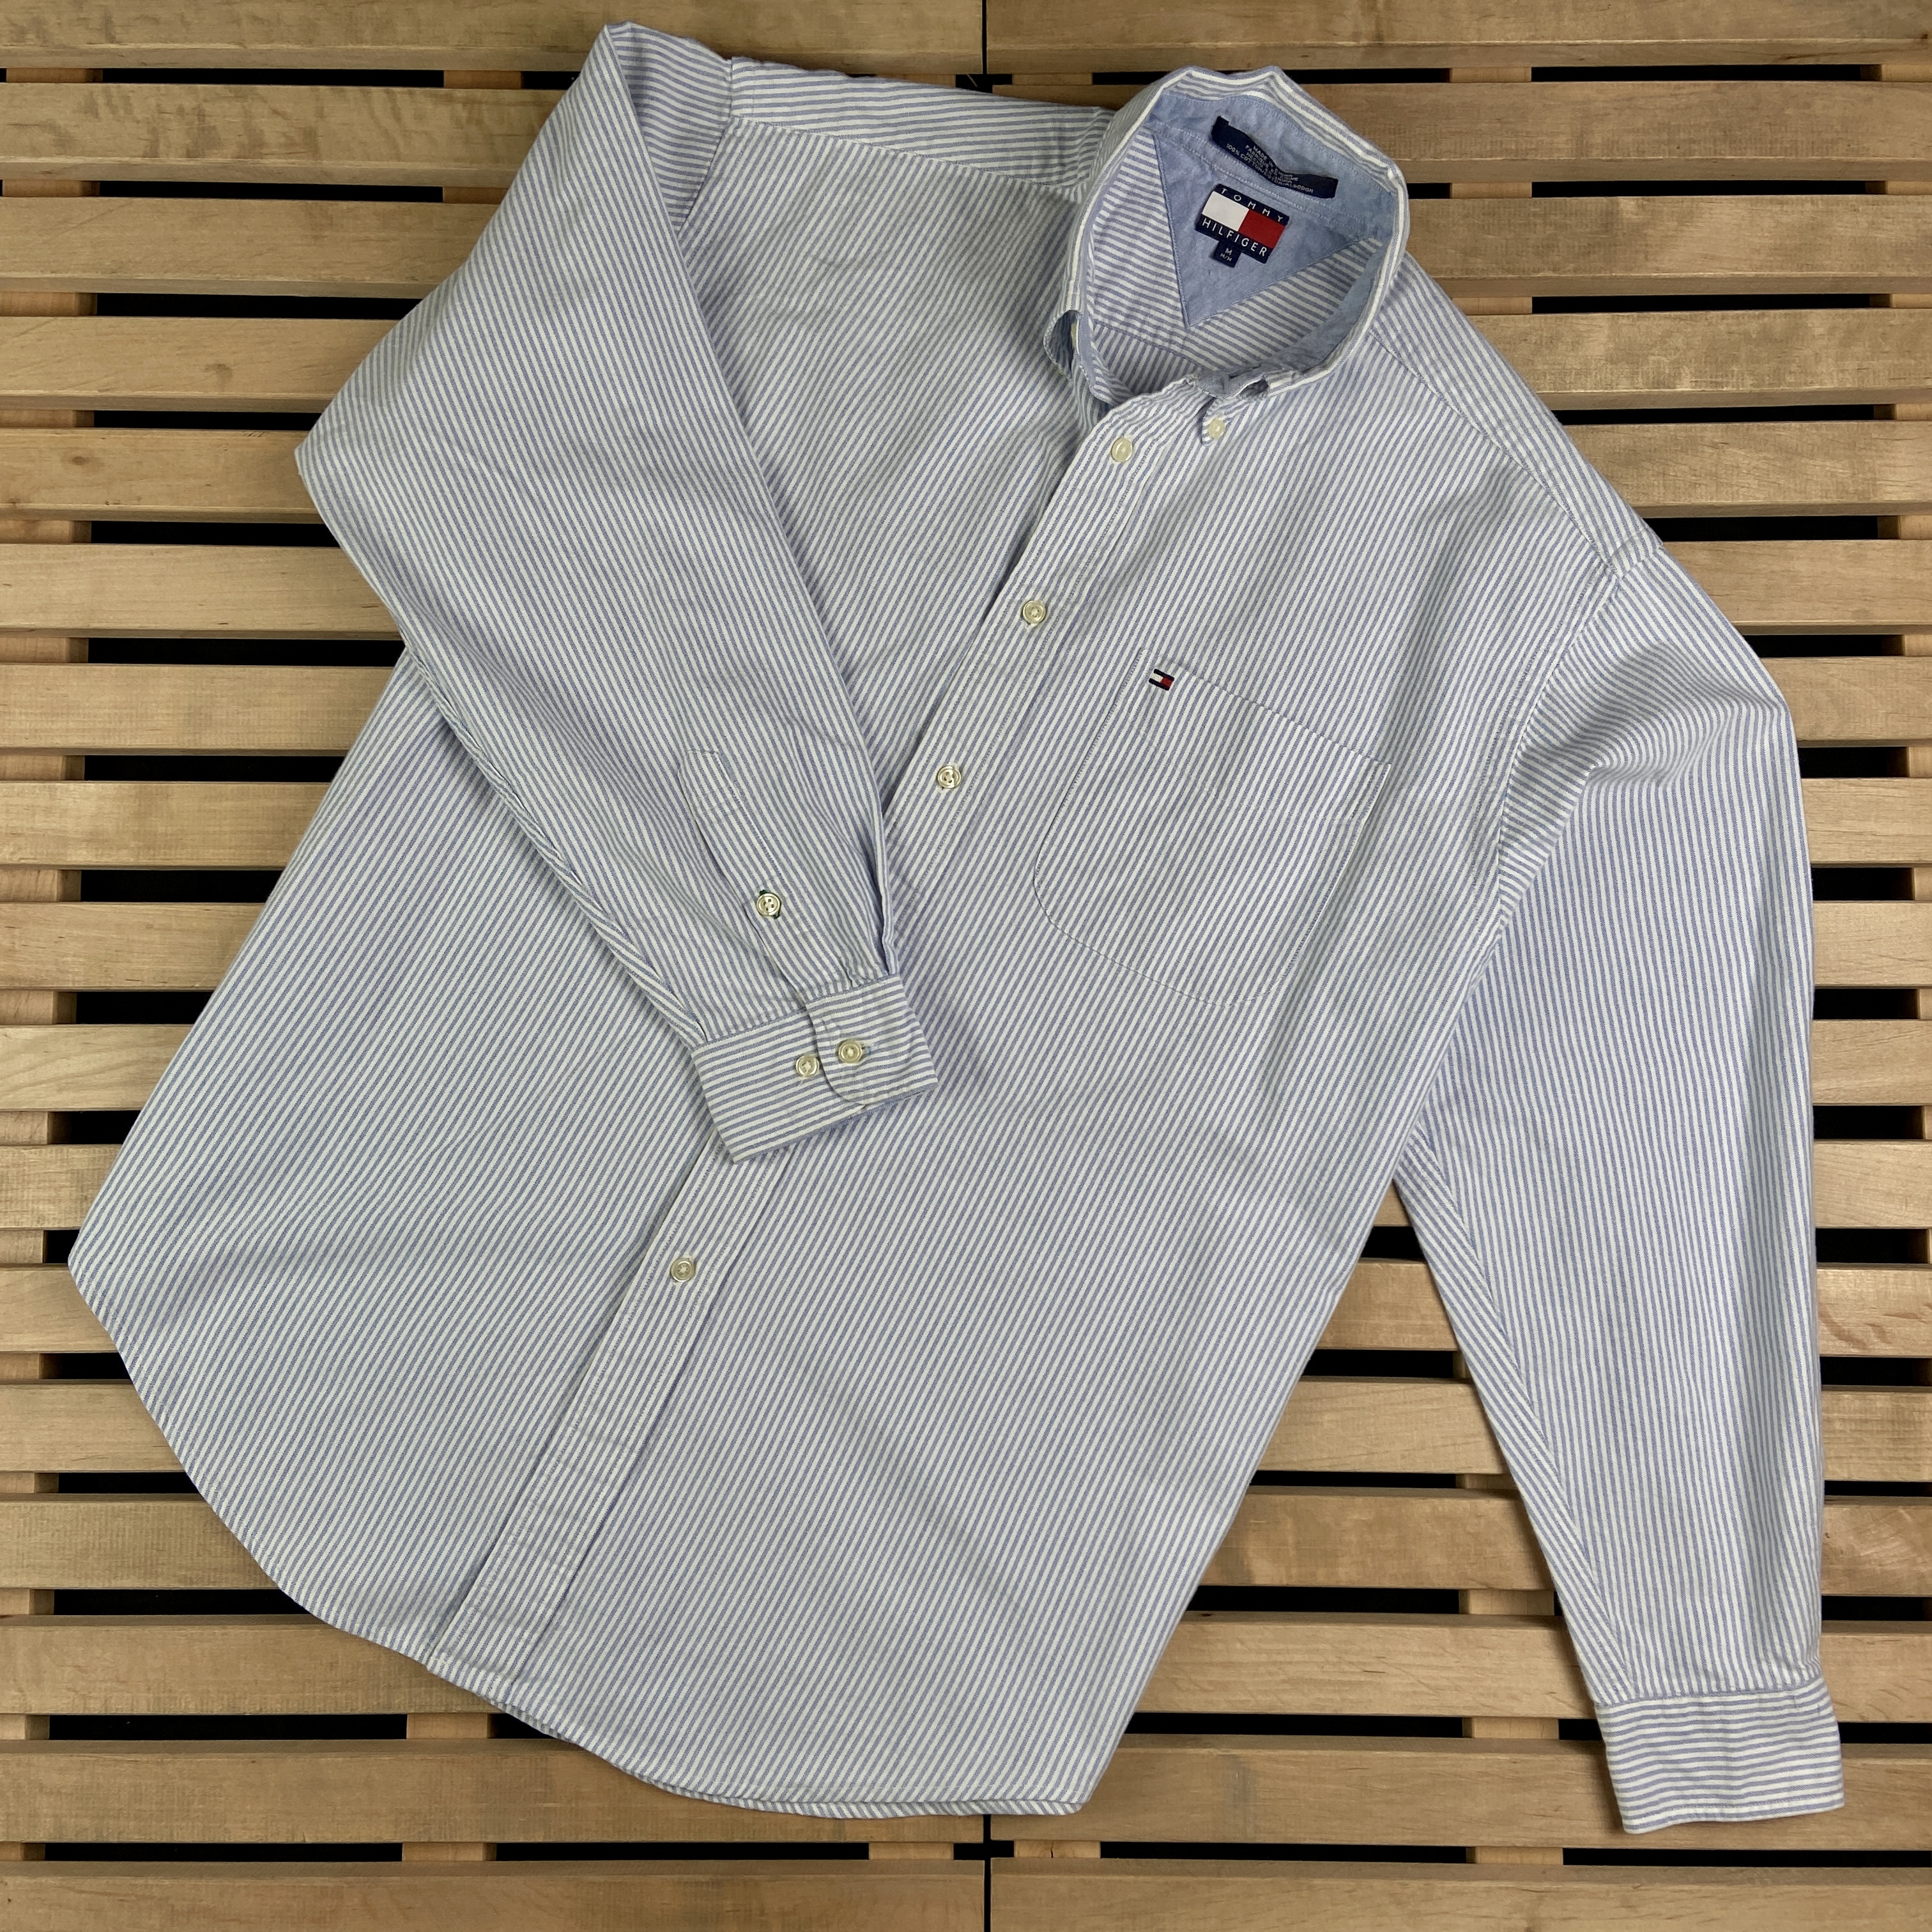 Vintage flannel lined Tommy Hilfiger button up size large